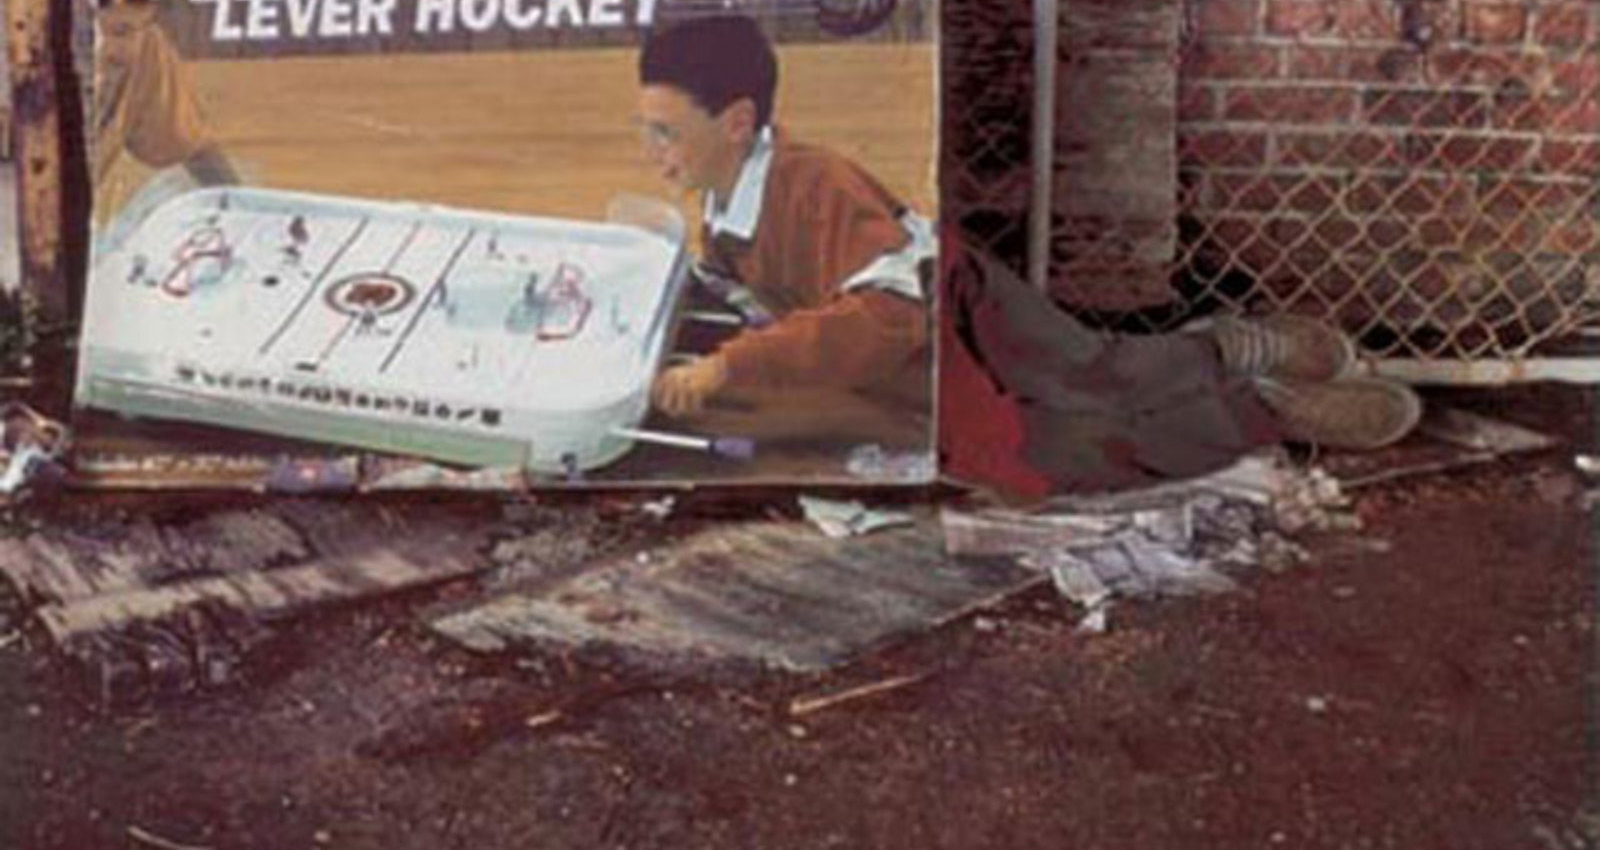 Computer, Hockey, Net